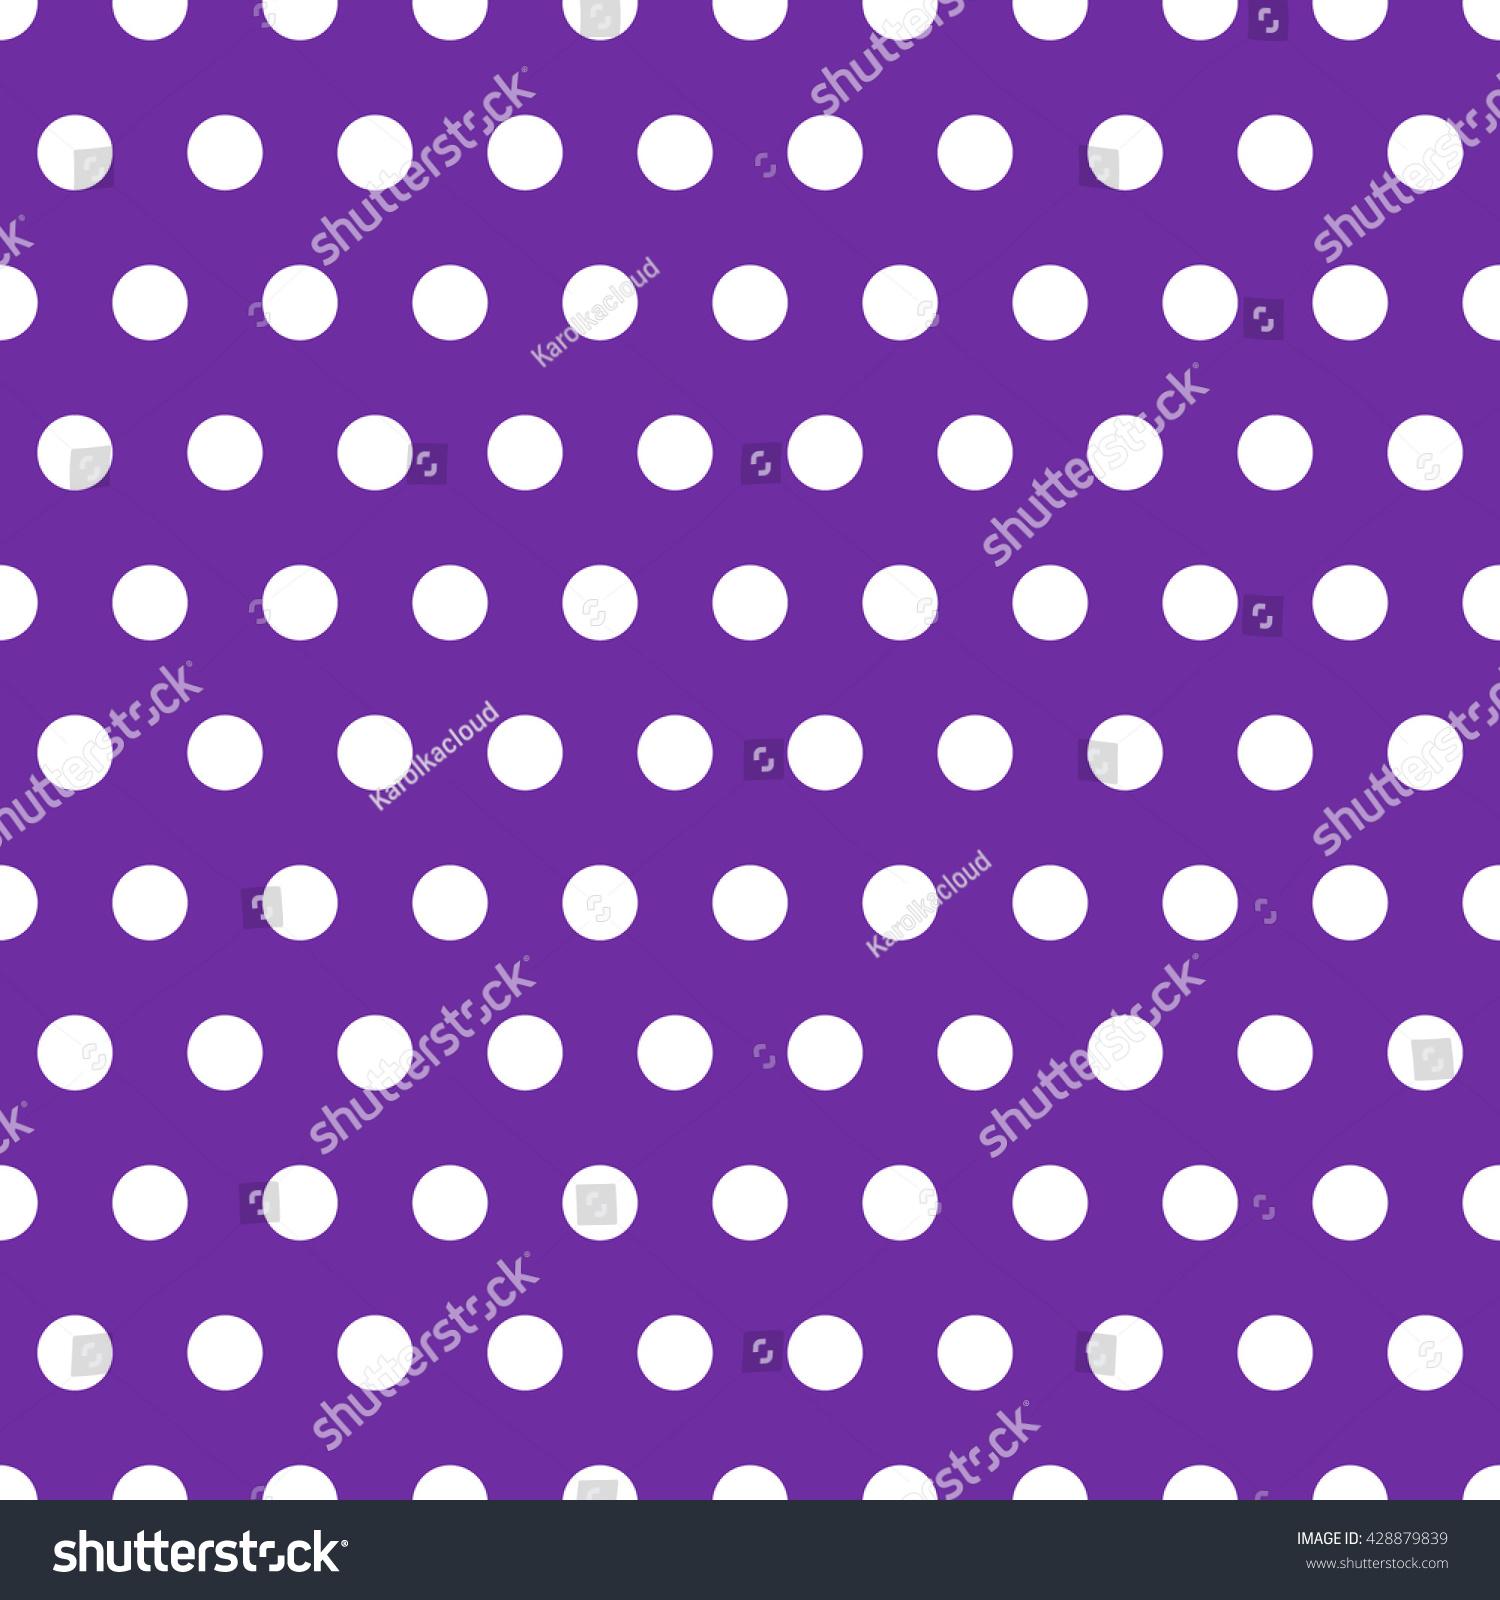 Abstract Polka Dot Seamless Pattern Retro Stock Vector Royalty Free